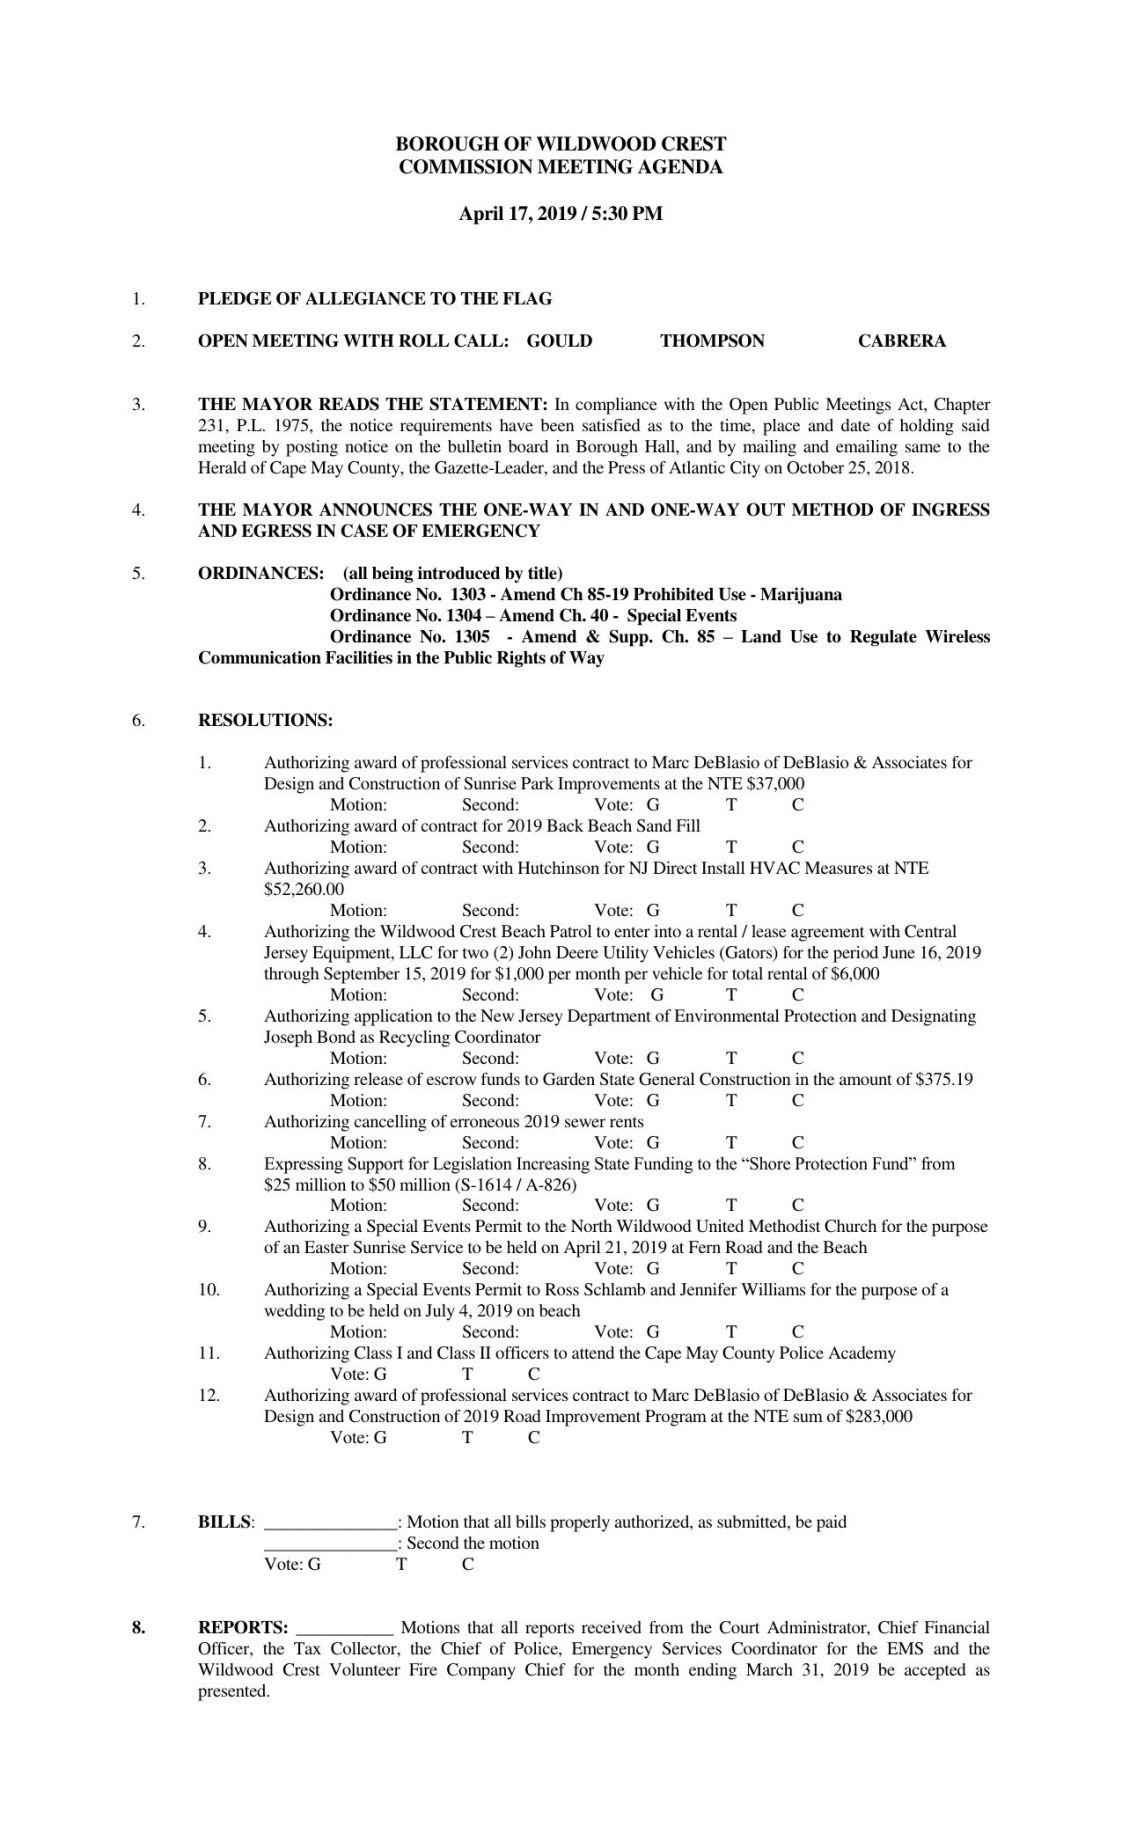 Wildwood Crest Commission Agenda April 17. 2019